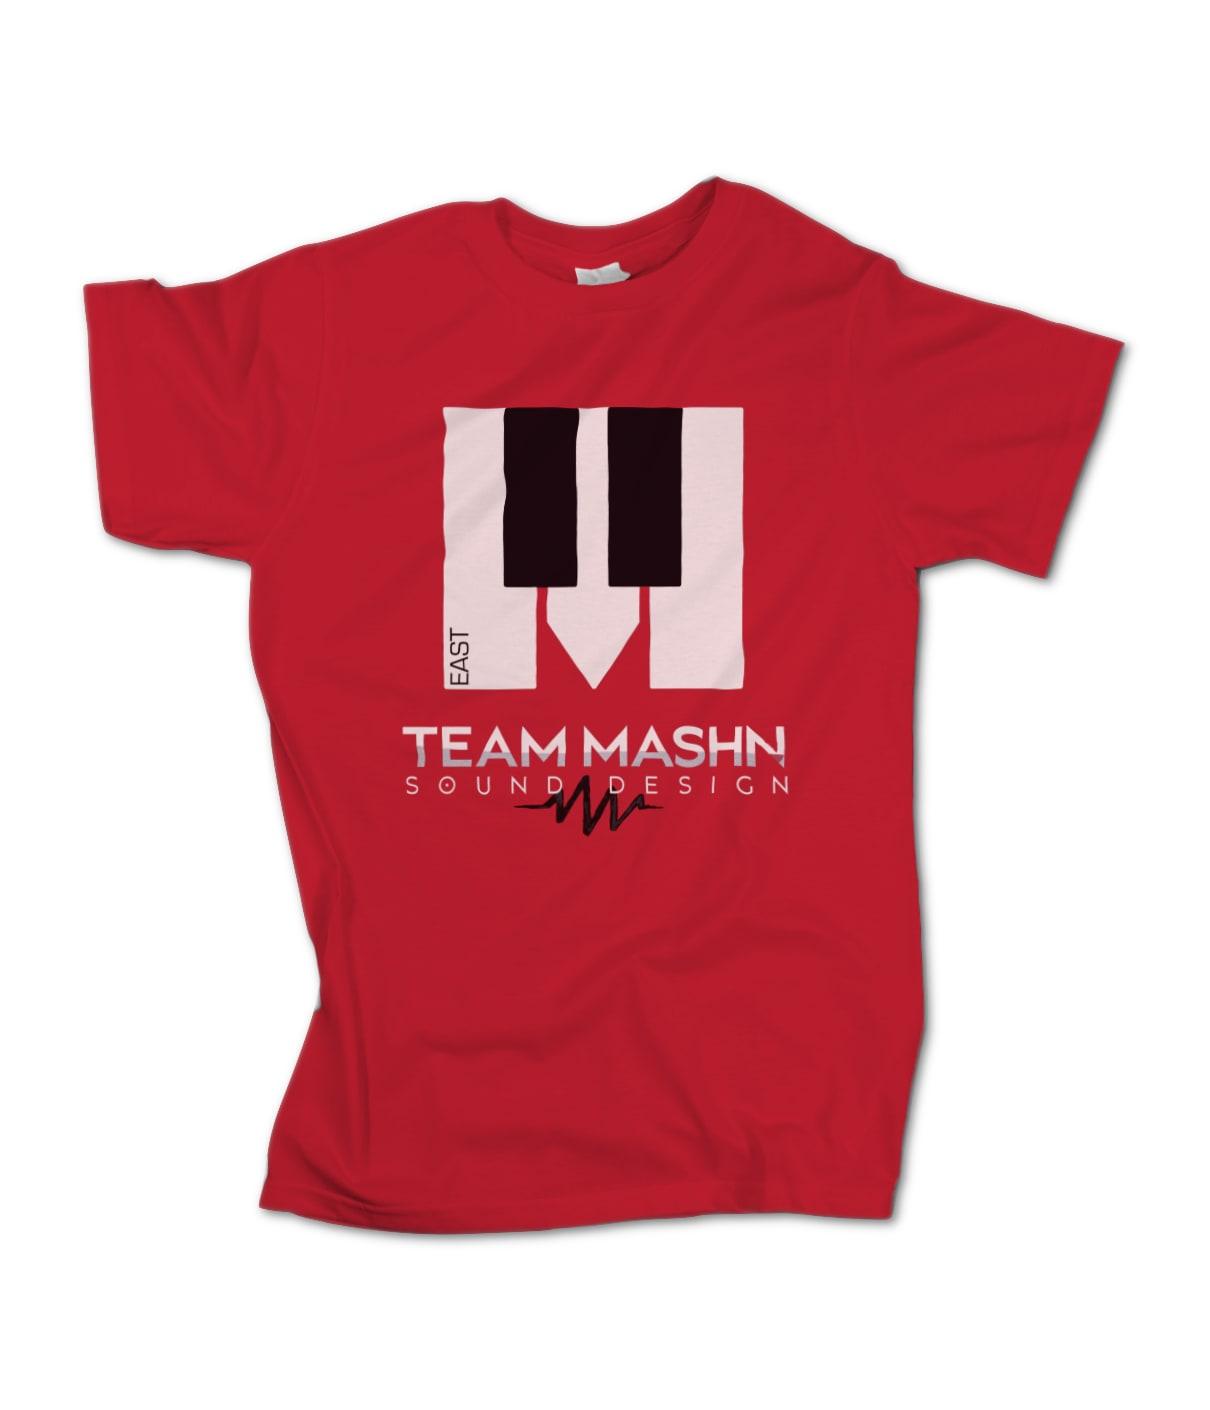 Tmsd team mashn sound design  east  1543802556